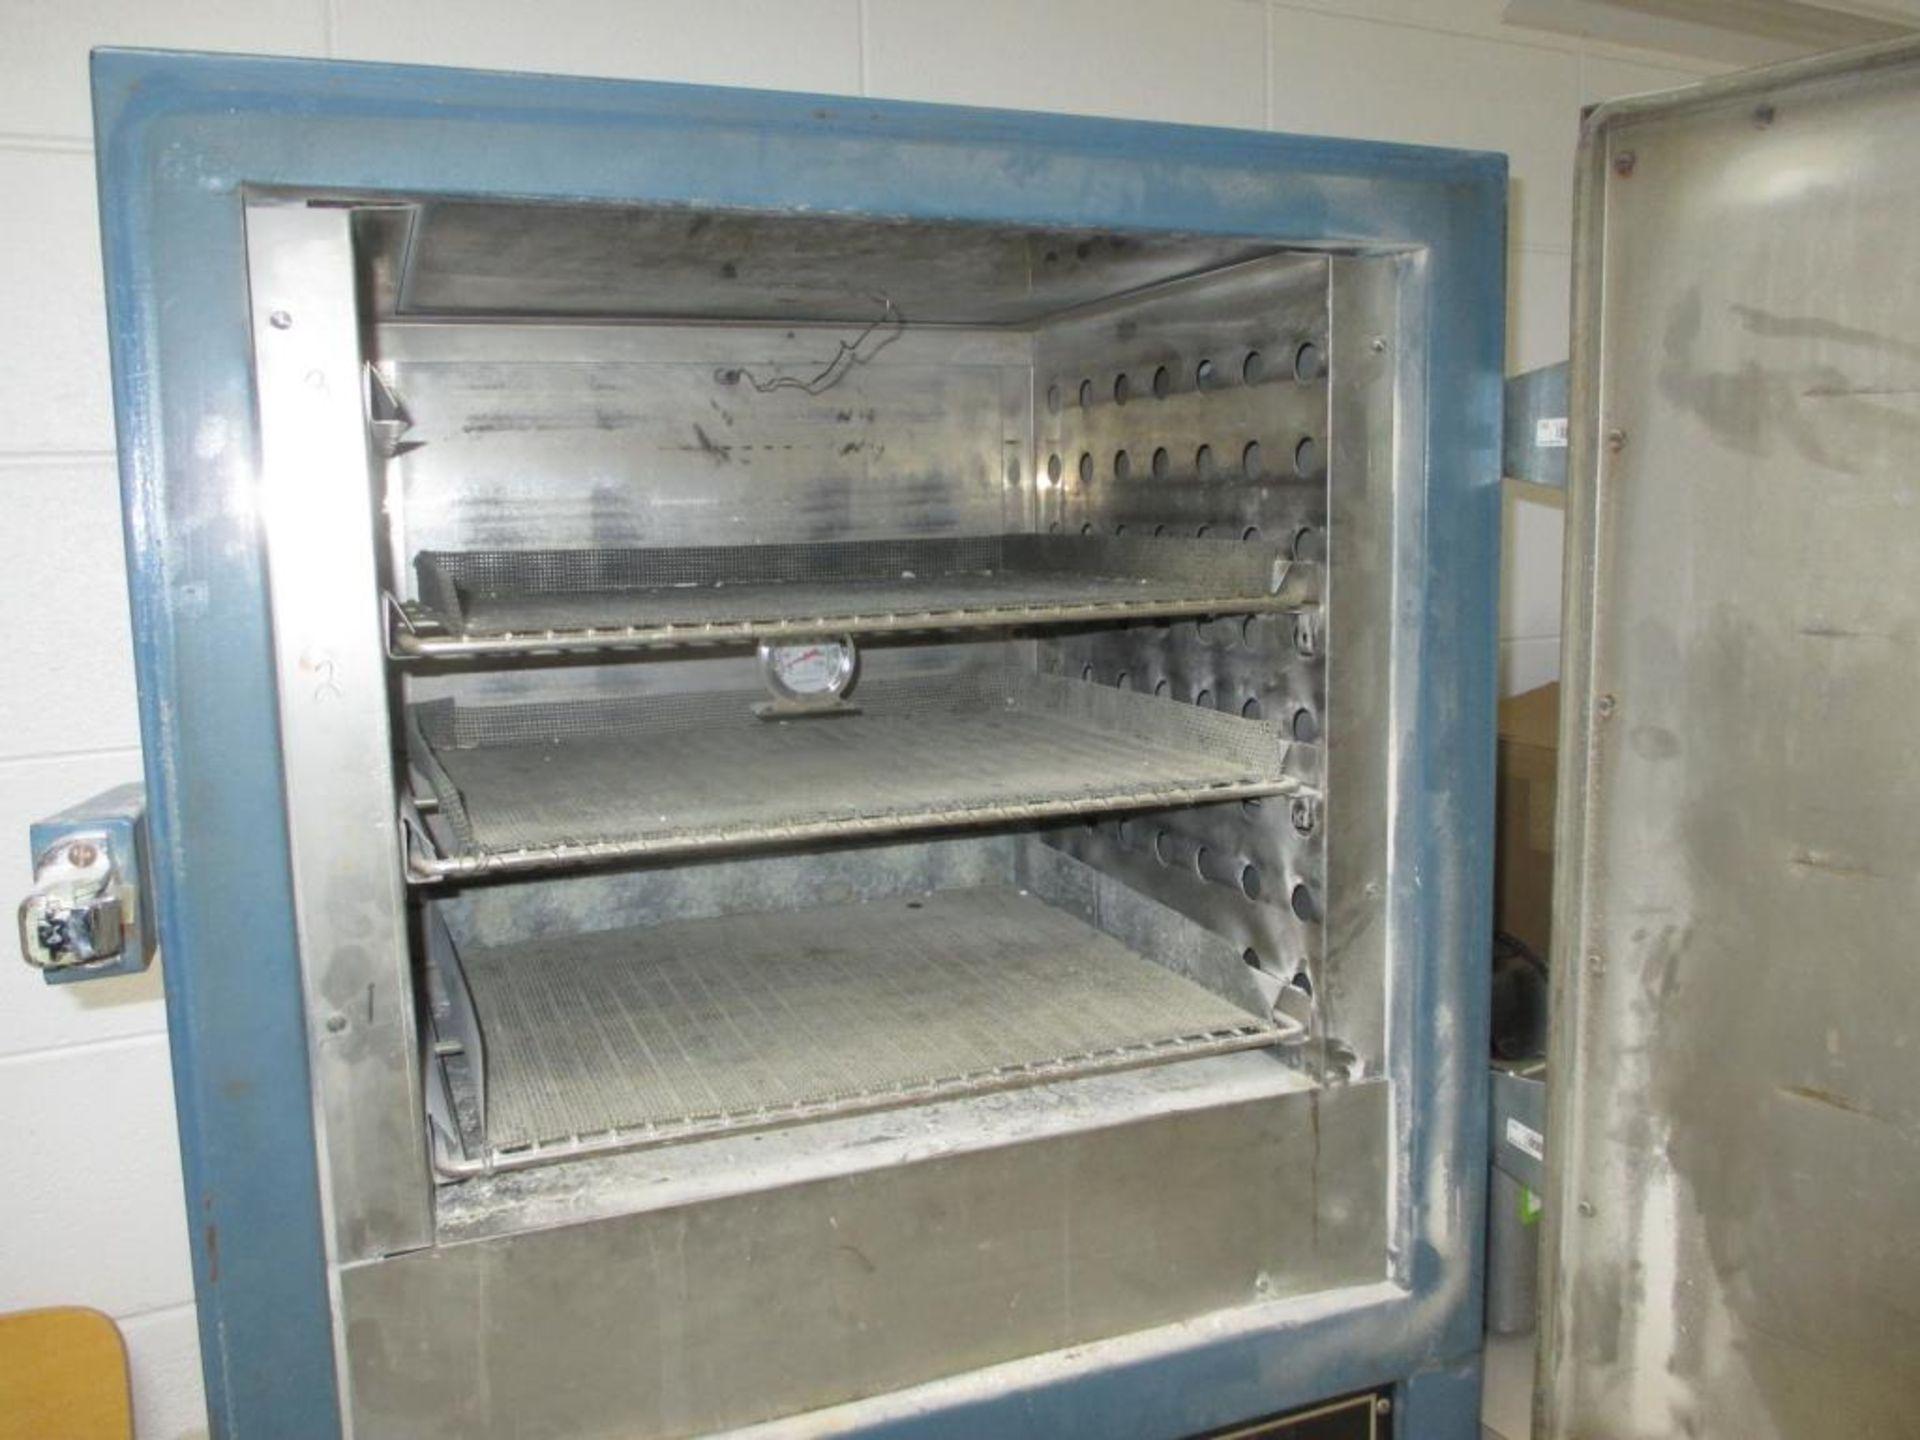 Lot 133 - Constant Temp Oven